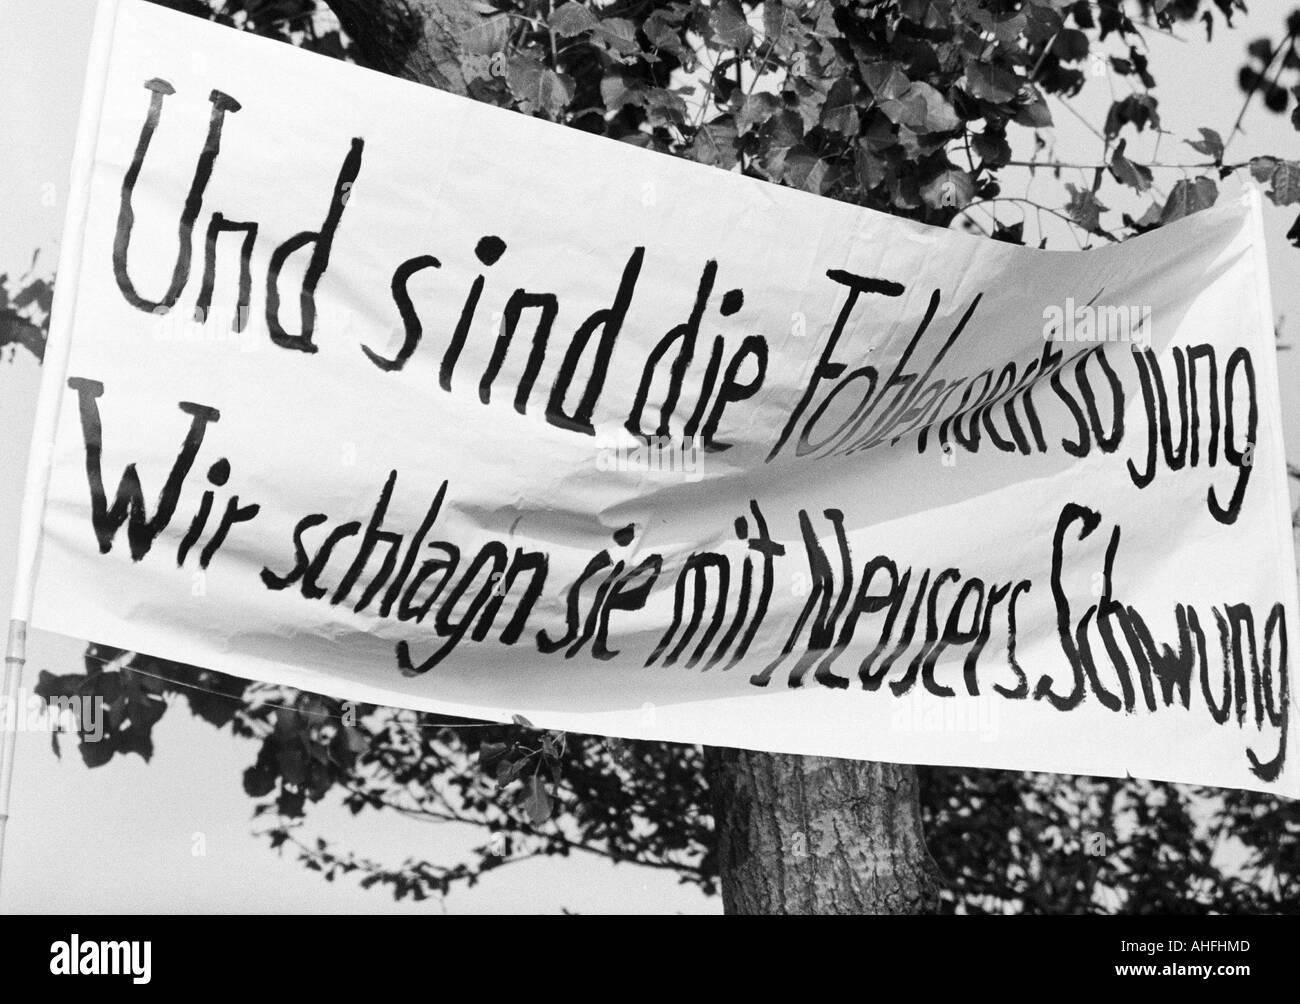 football, Bundesliga, 1966/1967, FC Schalke 04 versus Borussia Moenchengladbach 0:0, Stadium Glueckaufkampfbahn in Gelsenkirchen, banner of the Schalke fans - Stock Image